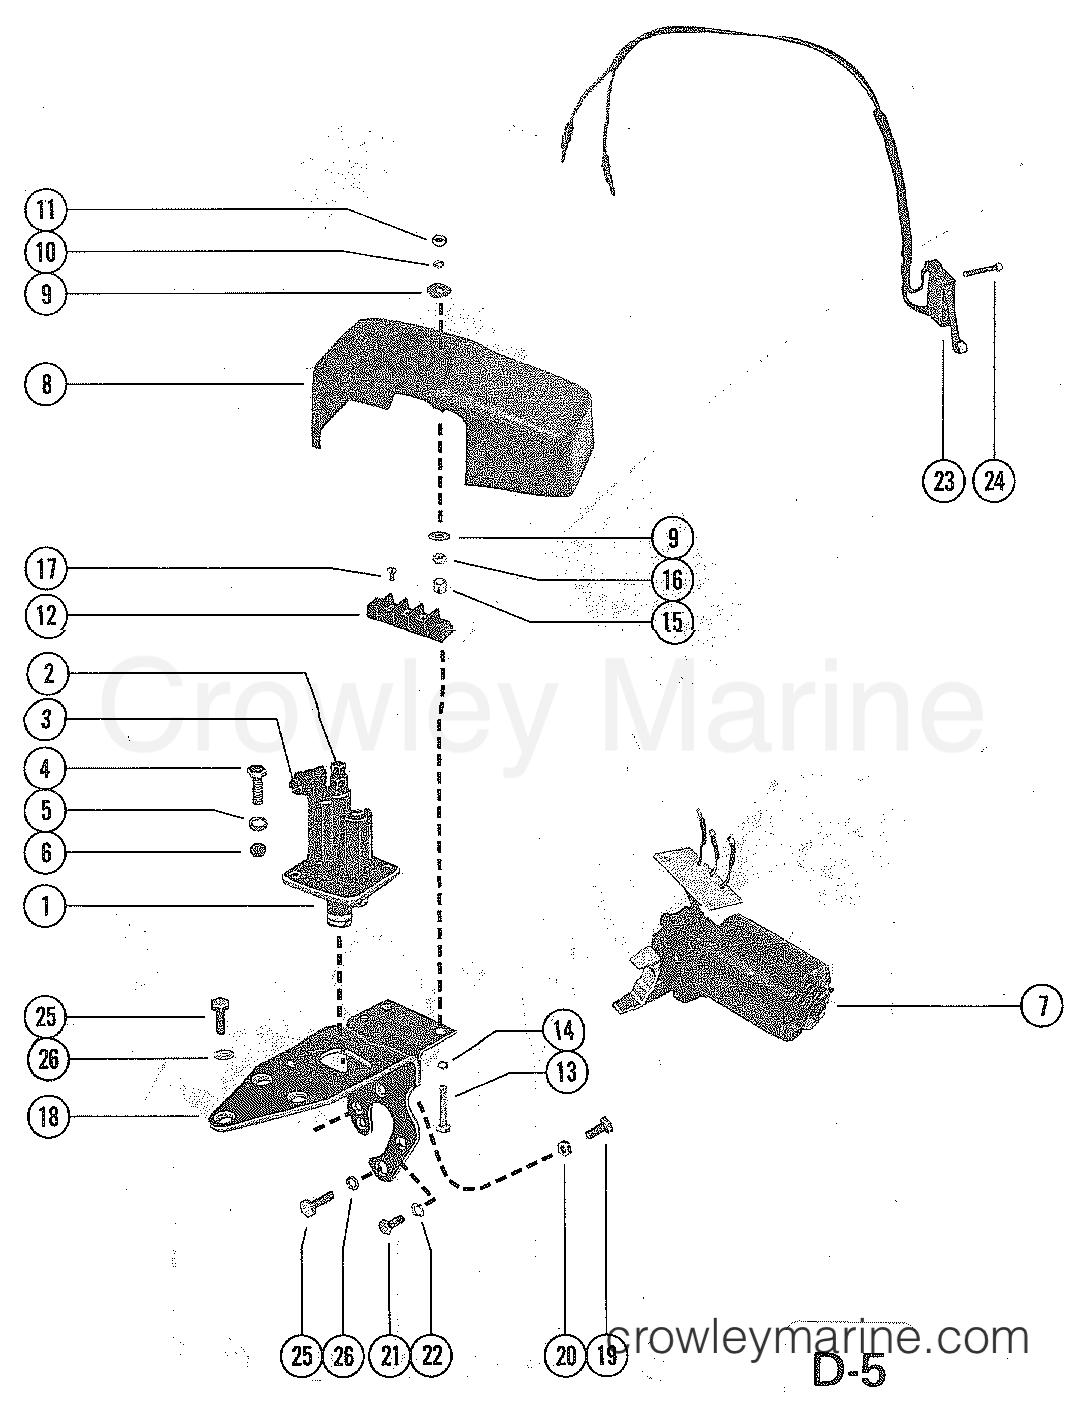 REVERSE LOCK VALVE AND SHIFT ACTUATOR (MCM 228 TR